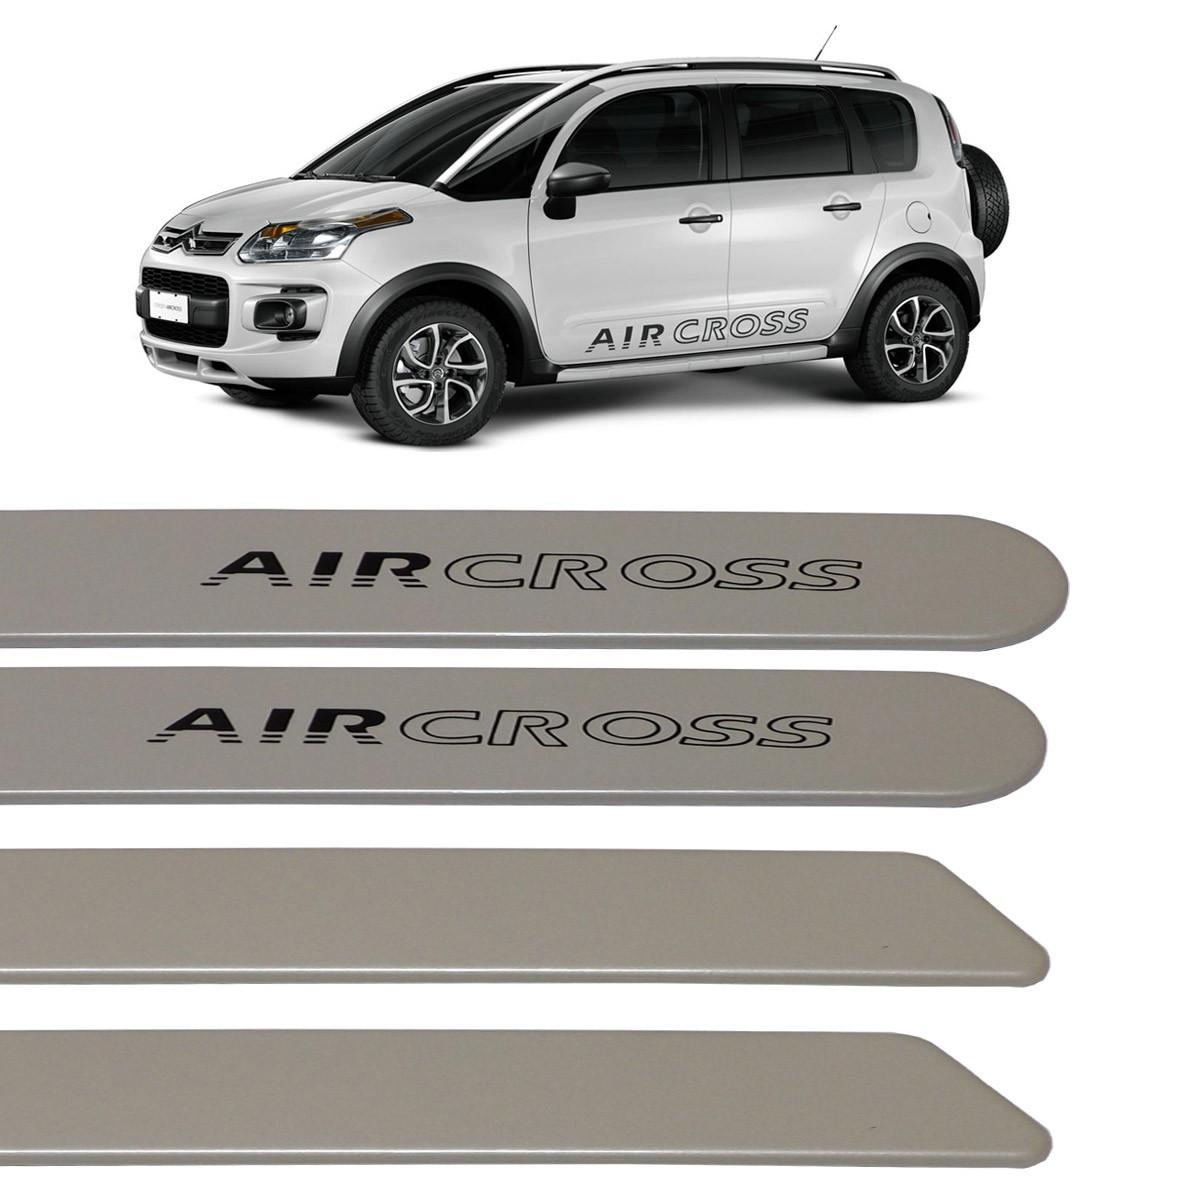 Jogo Friso Lateral AirCross Branco Nacre 2013 até 2016